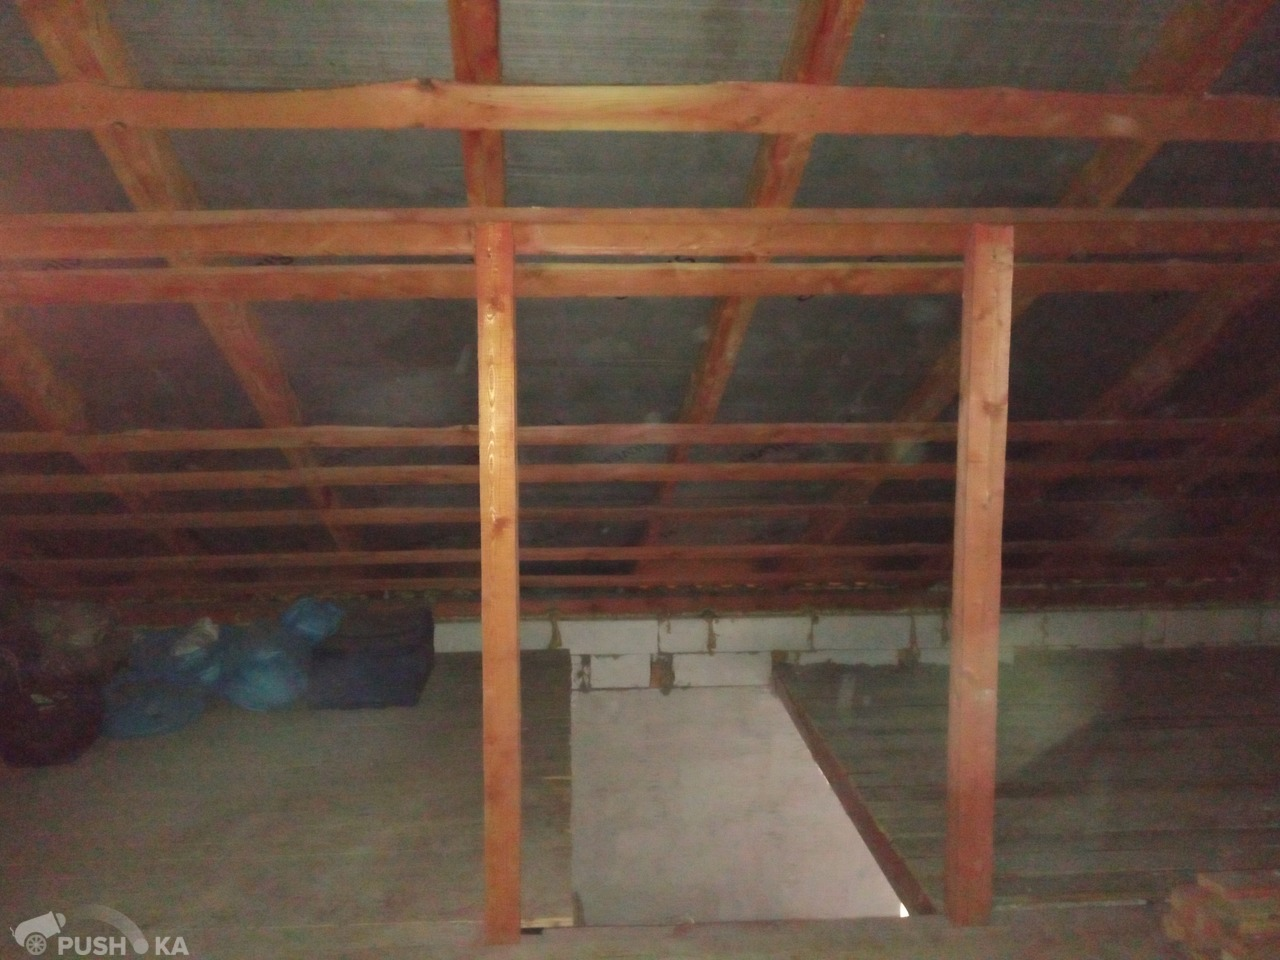 Продаётся 2-комнатная квартира 54.5 кв.м. этаж 3/3 за 3 300 000 руб